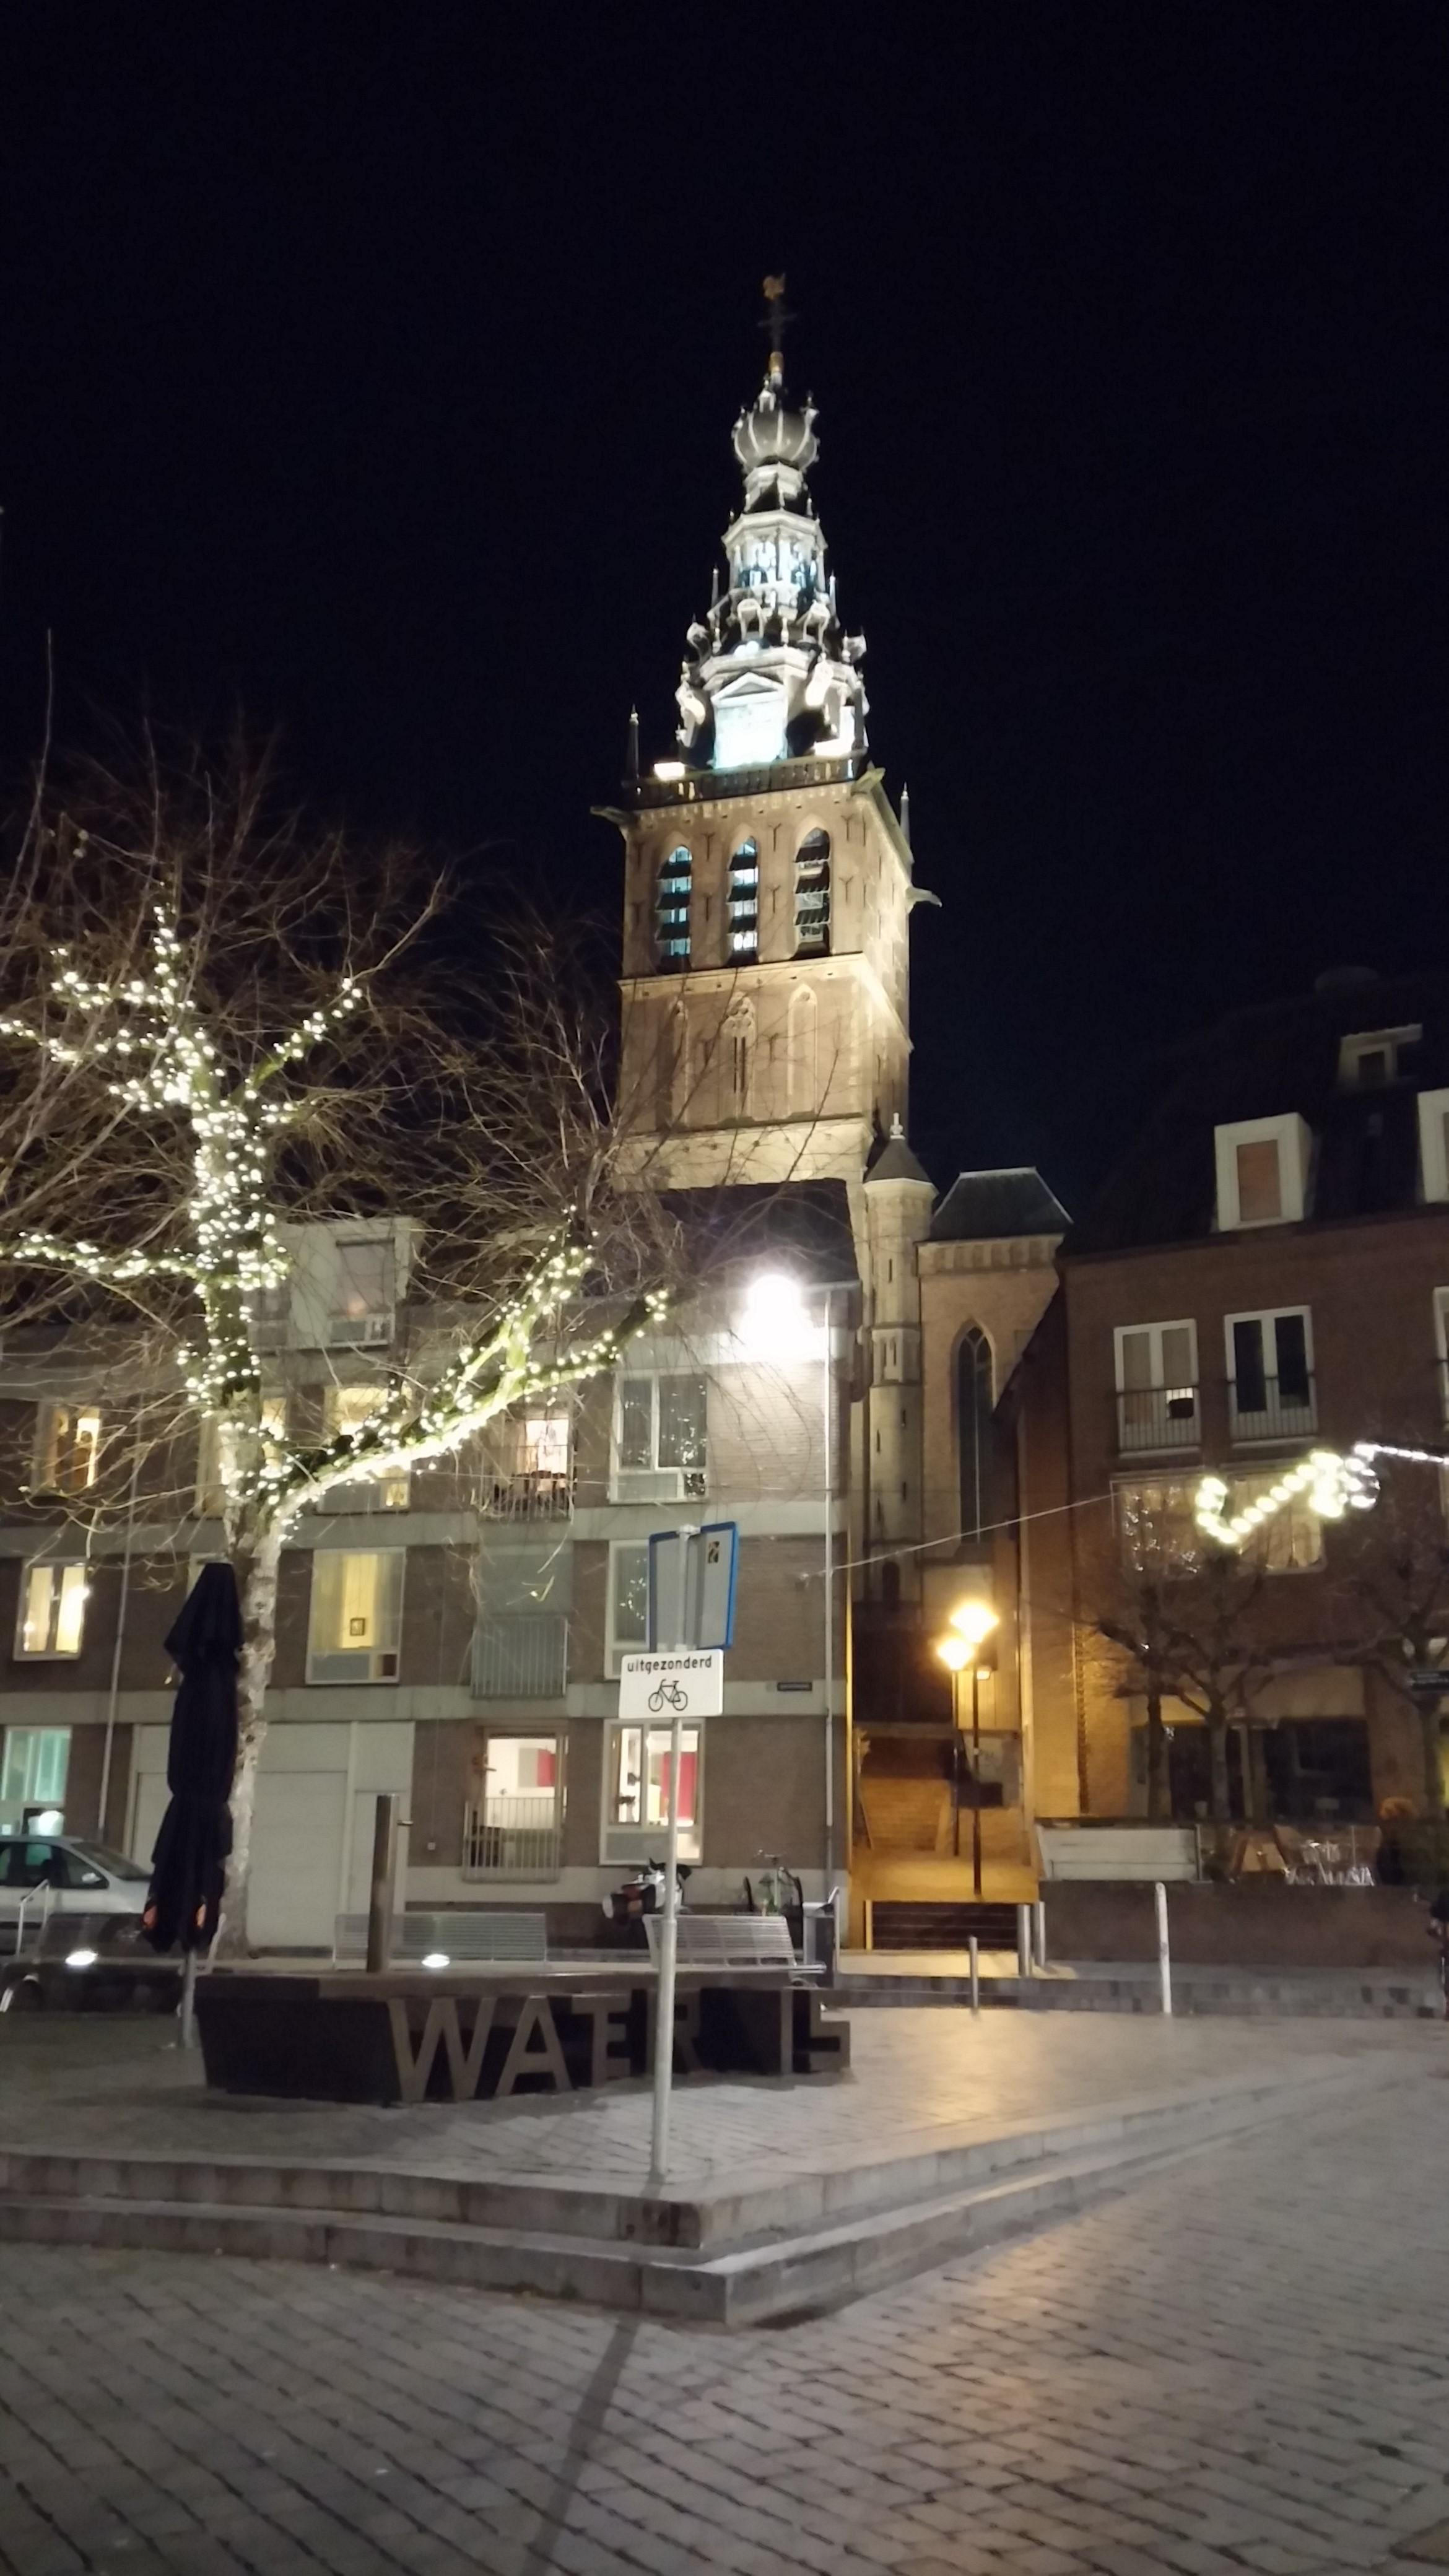 St. Stephen's Church at night